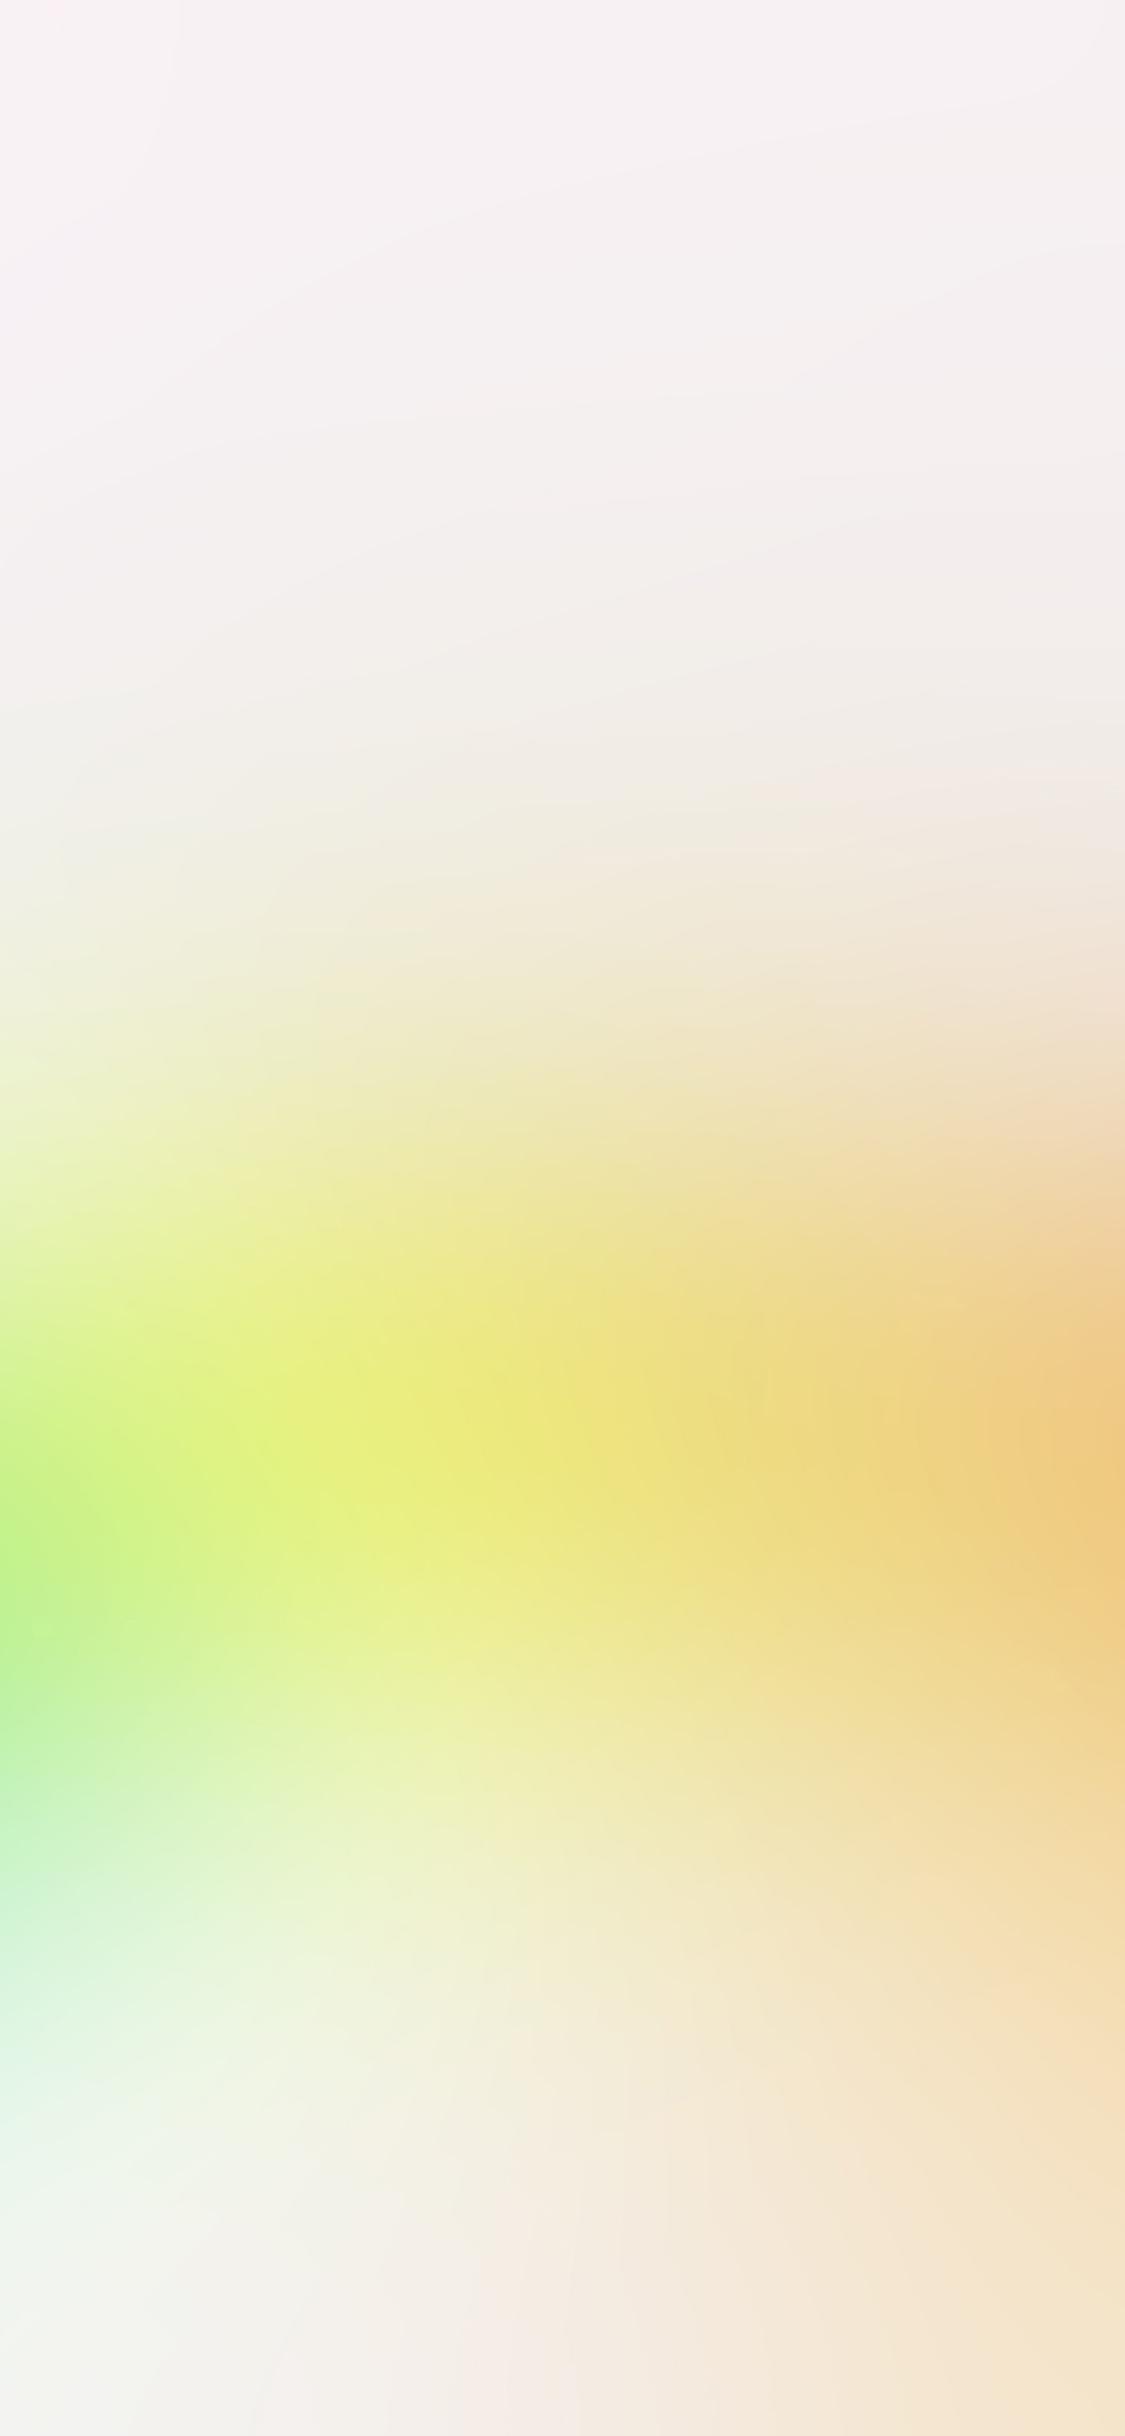 iPhoneXpapers.com-Apple-iPhone-wallpaper-sc40-sub-glow-light-skin-food-blur